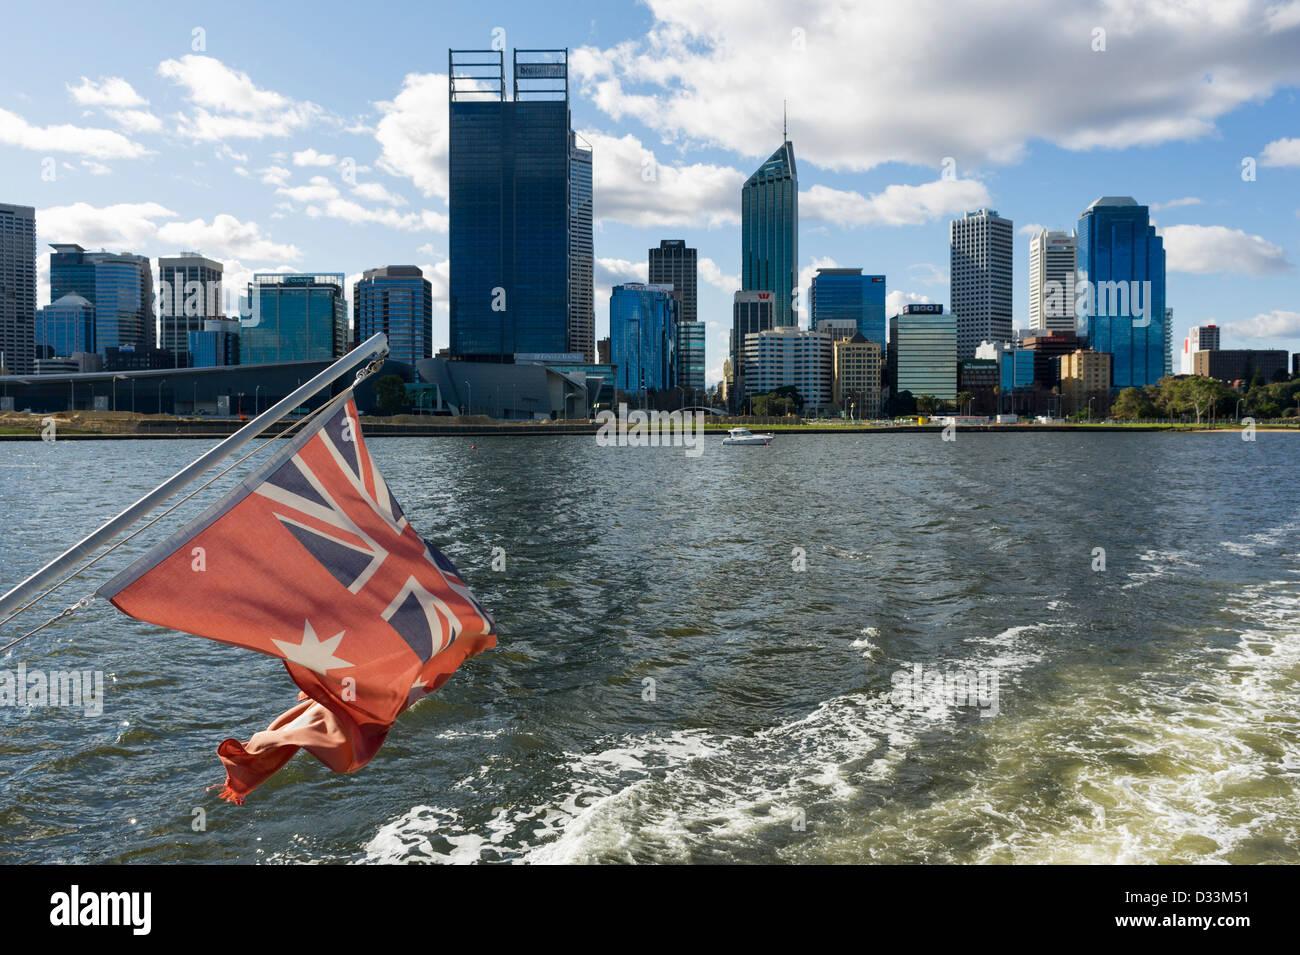 The Swan River in Perth, Western Australia - Stock Image